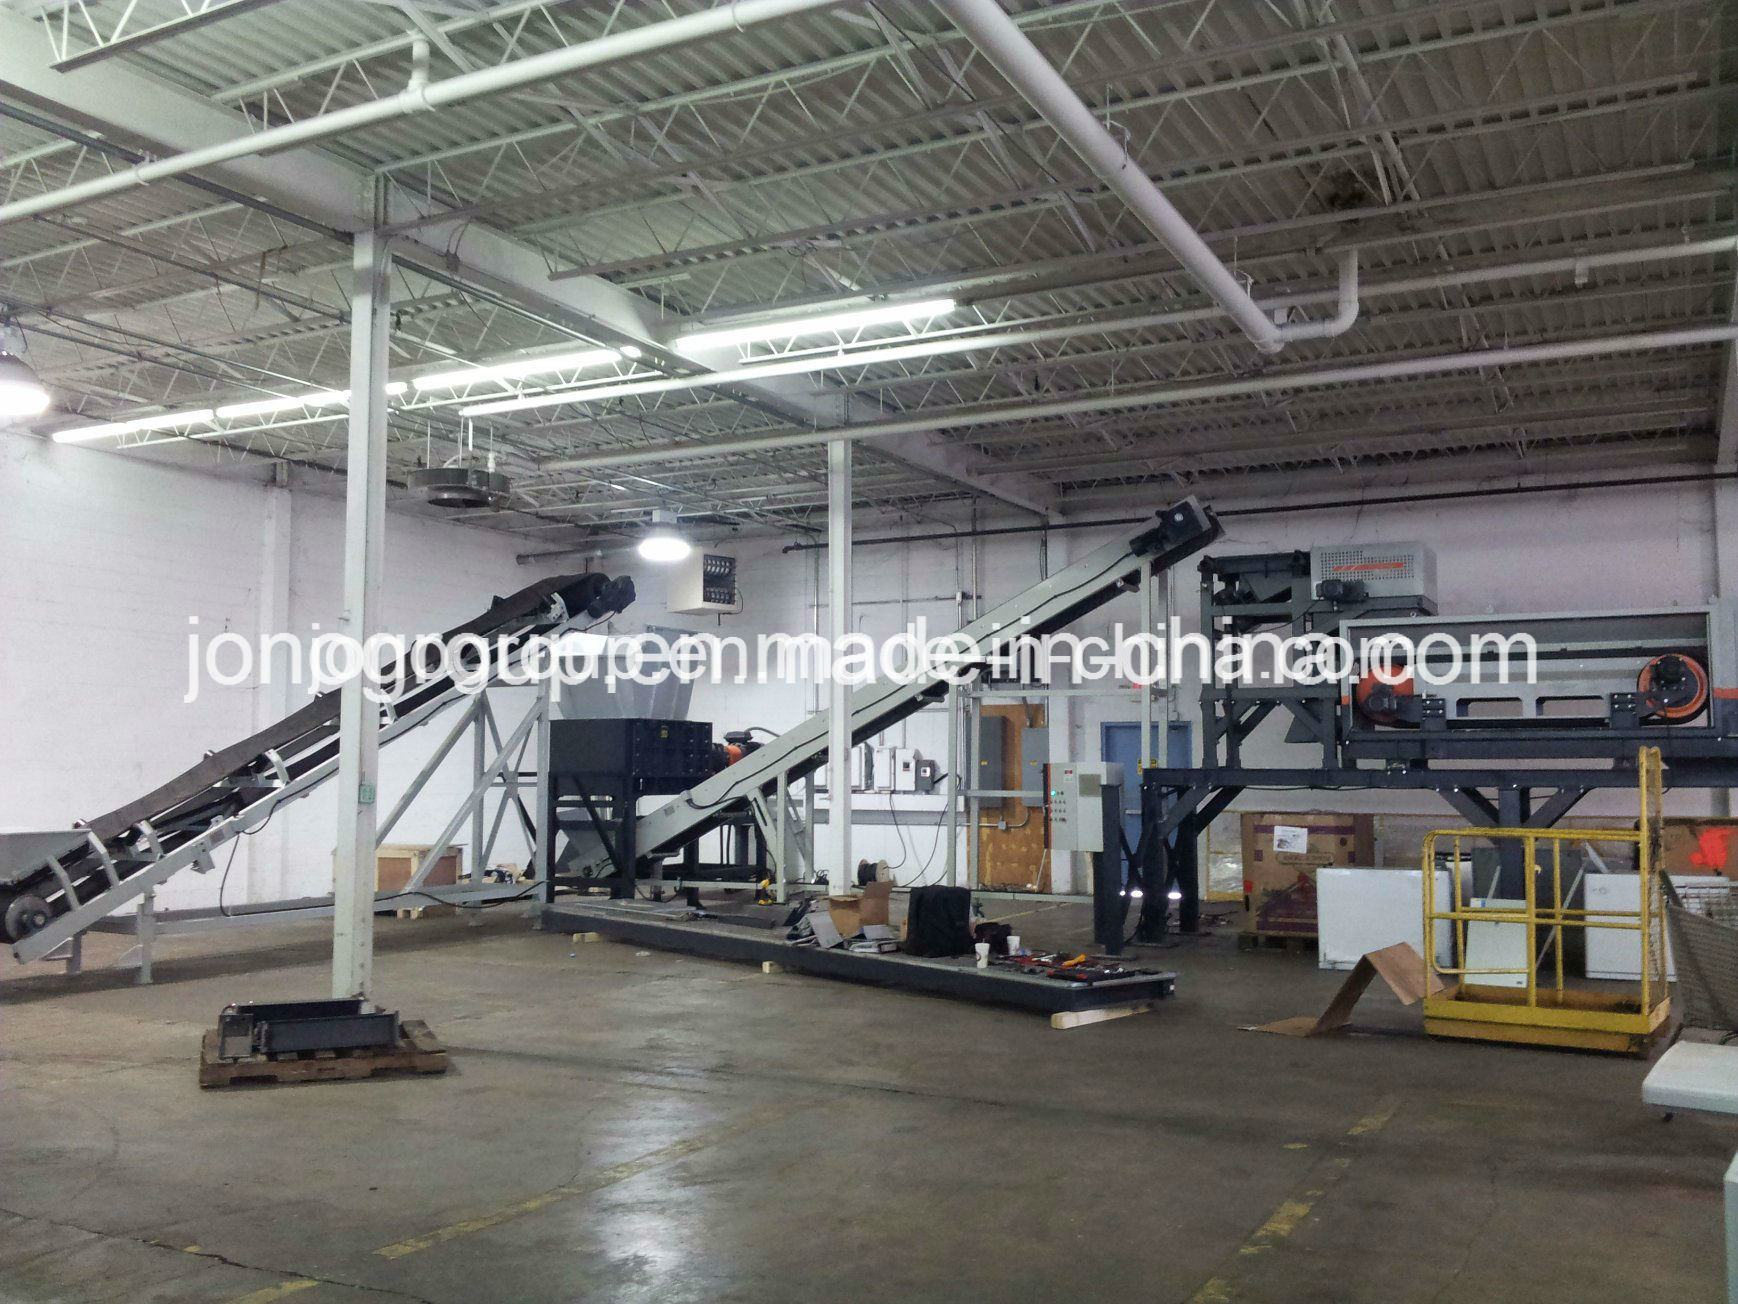 1pss3410b Quadruple-Shaft (Shear) Shredder for Metal Recycling Industry